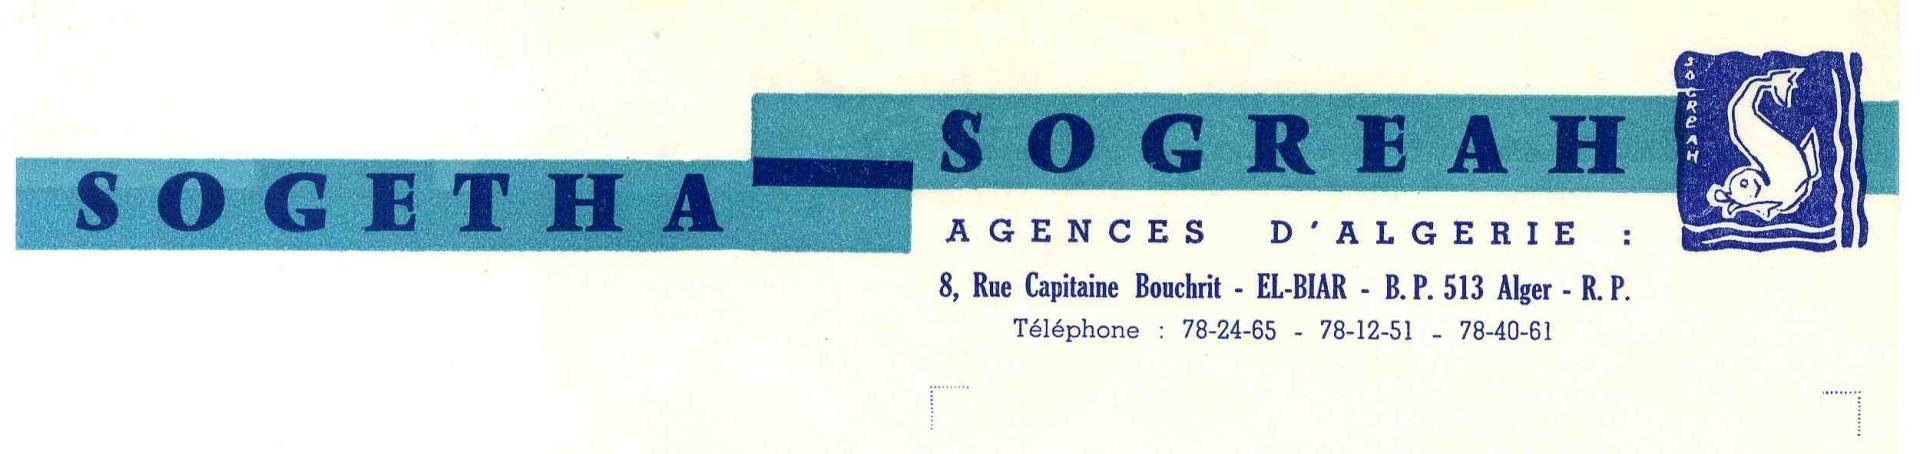 05 sogetha logo 1971